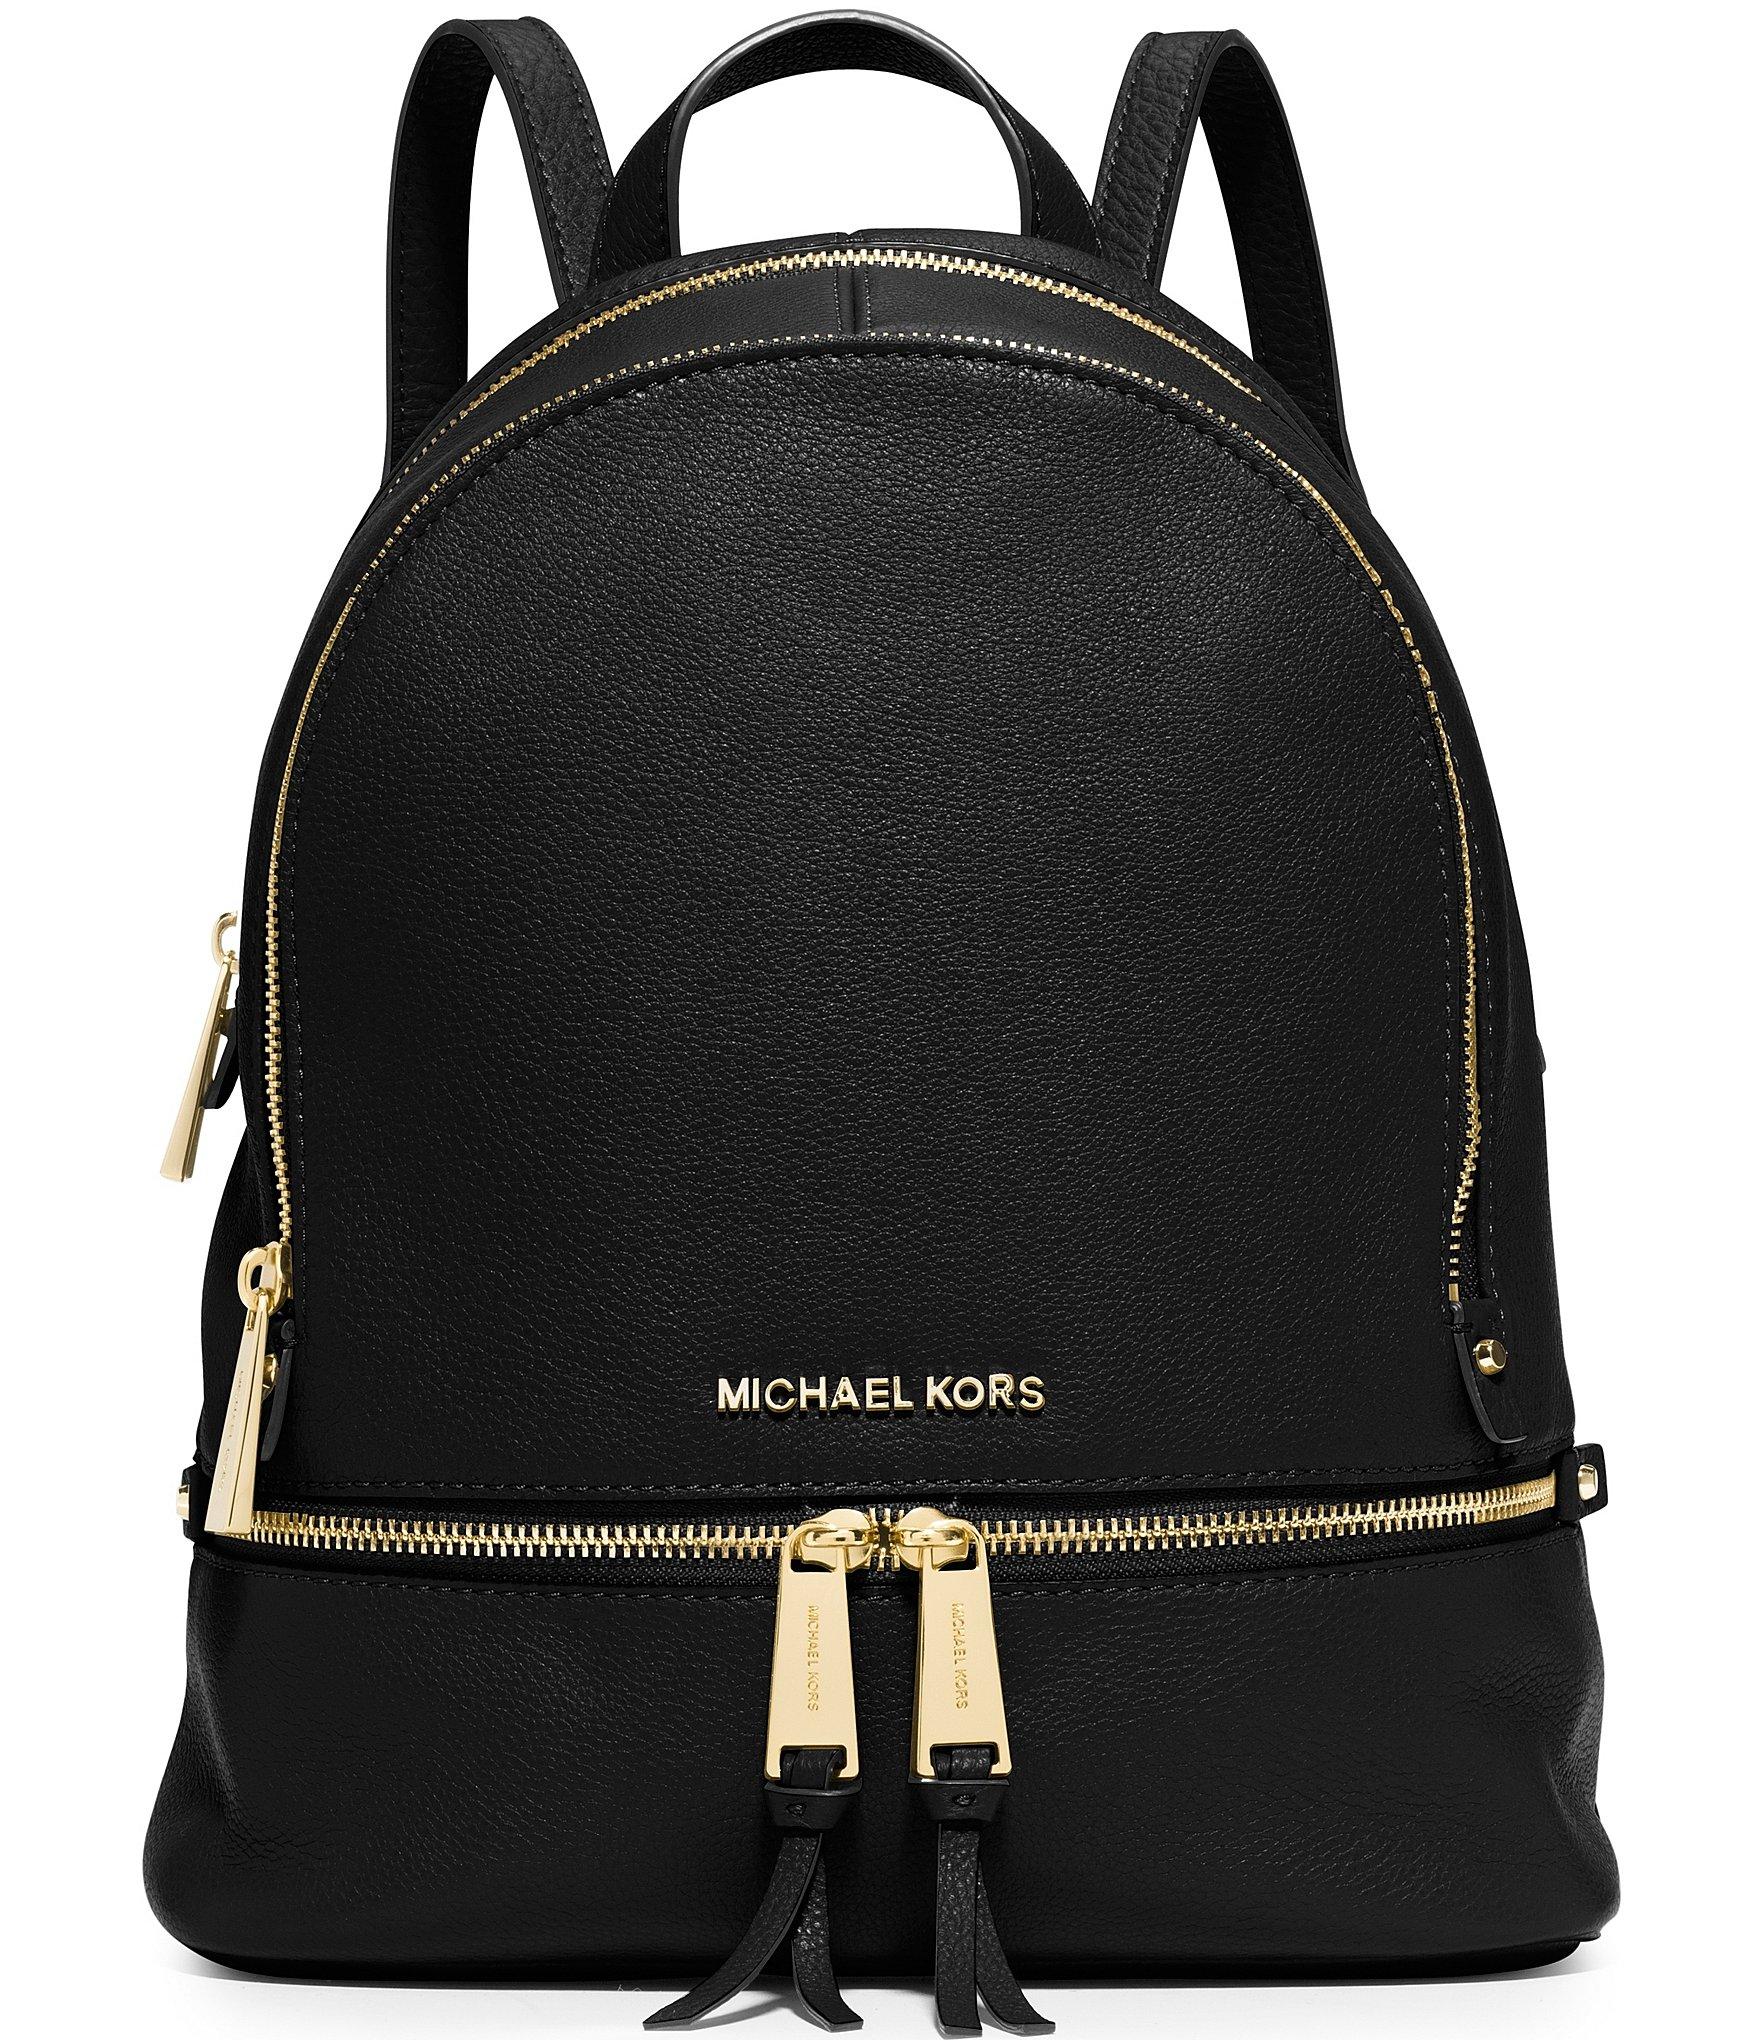 a7c662c65d2d MICHAEL Michael Kors Rhea Zip Medium Pebble Leather Backpack